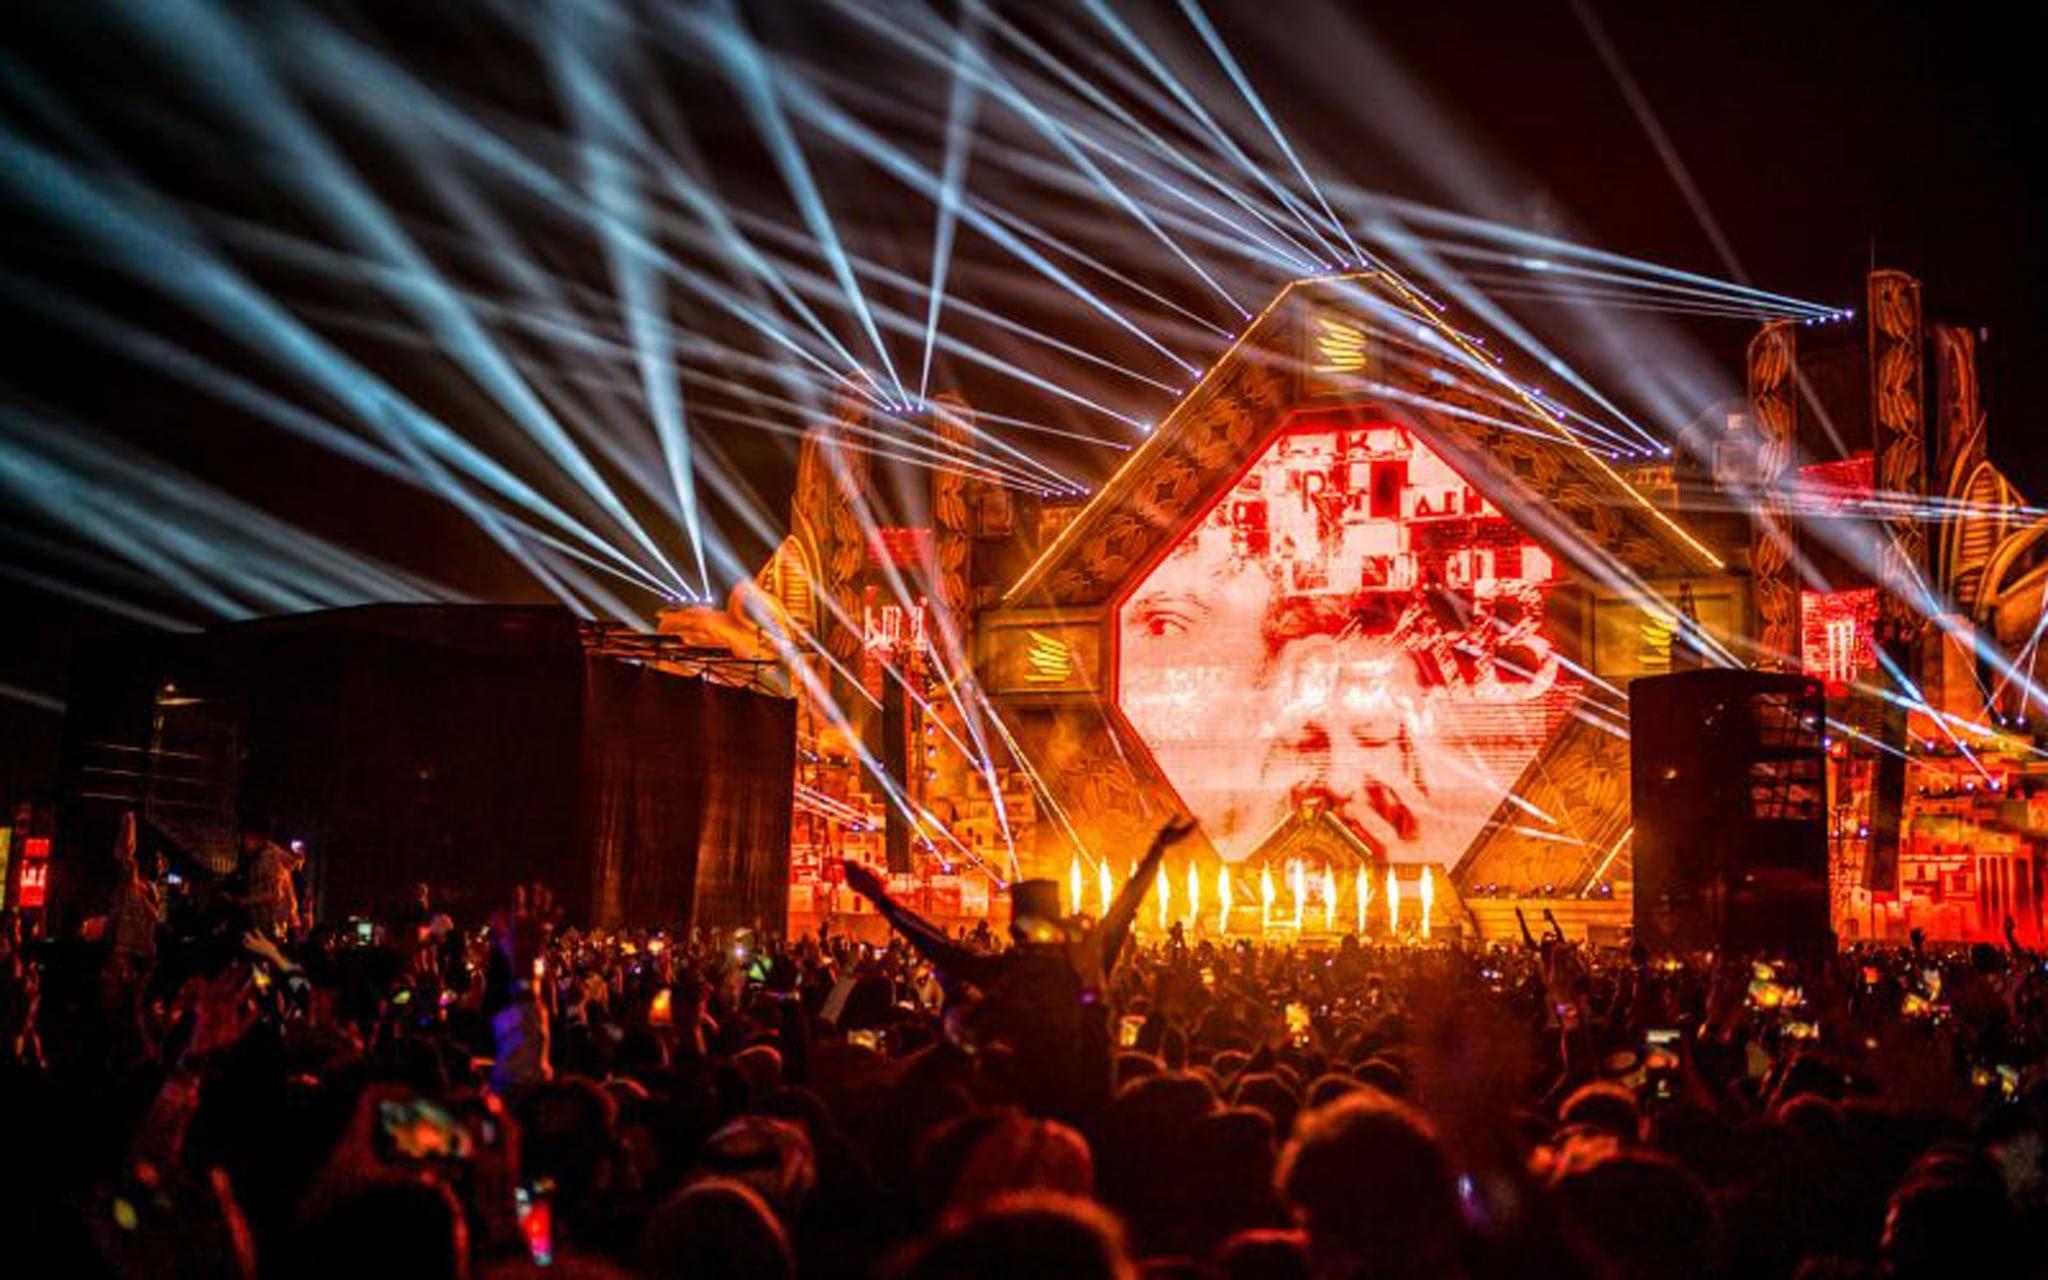 MDLBEAST SOUNDSTORM Starts Lineup Rollout: Deadmau5, Eric Prydz, Martin Garrix, & More